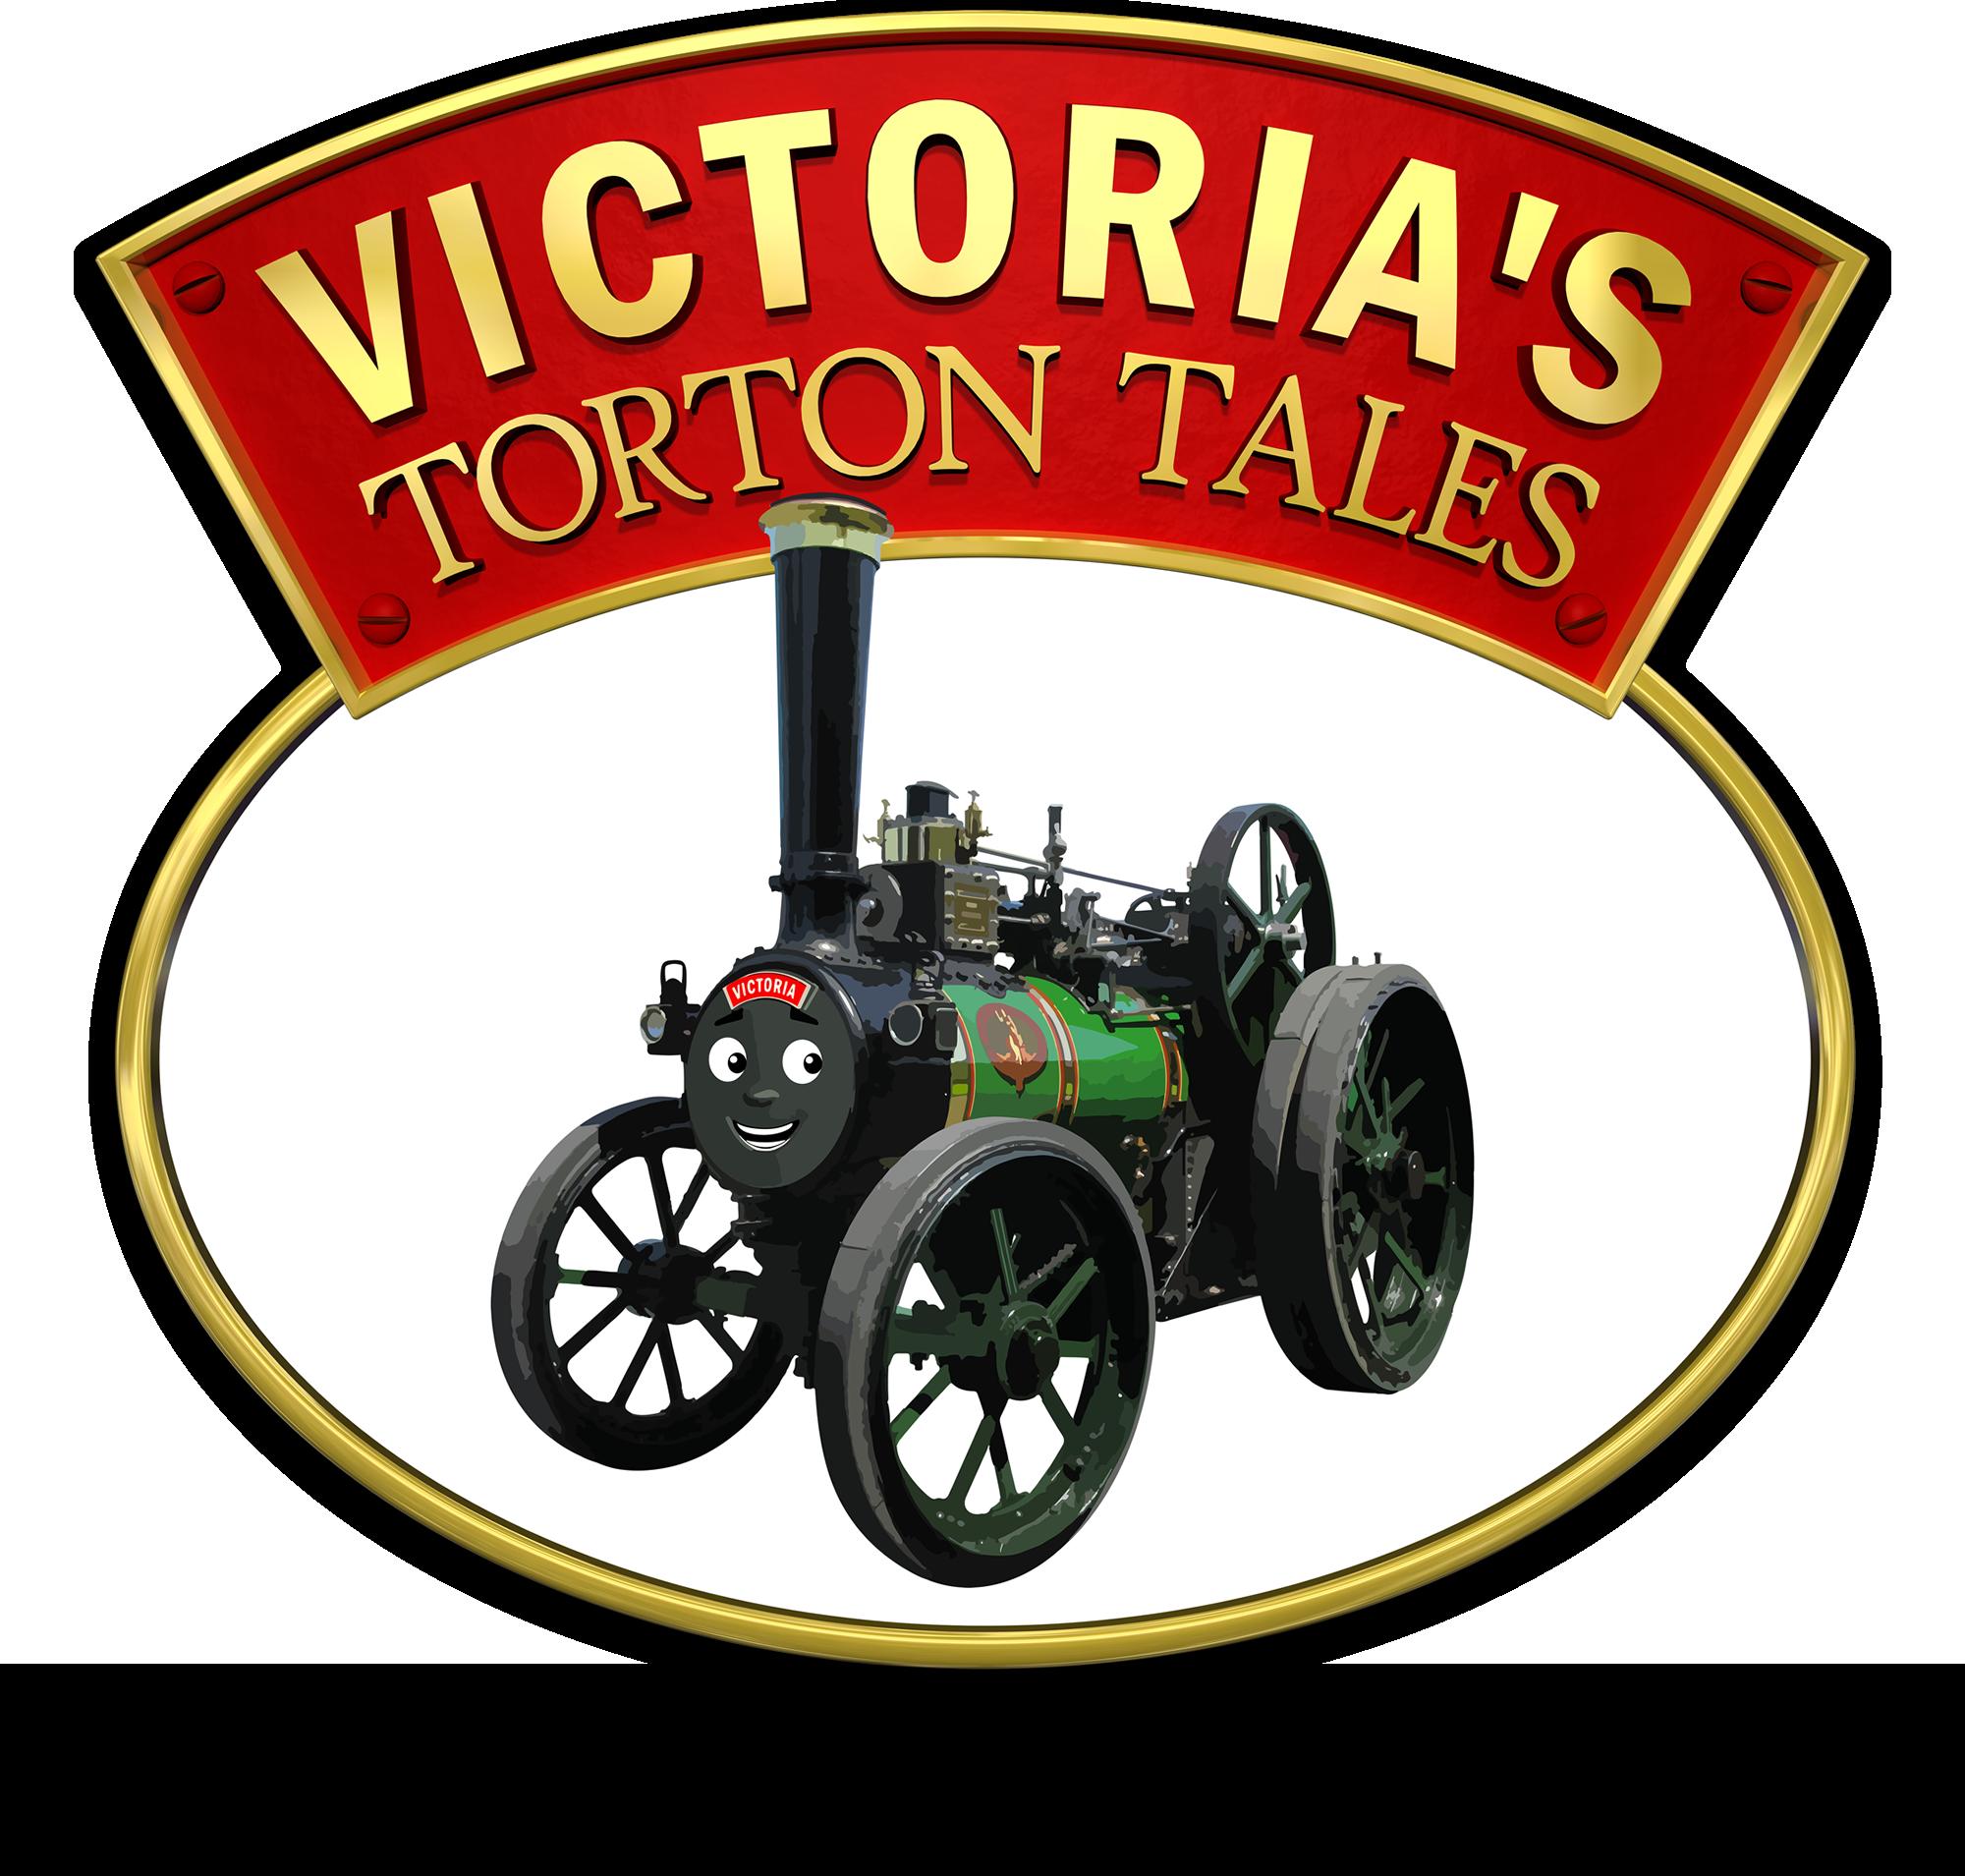 Victoria's Torton Tales